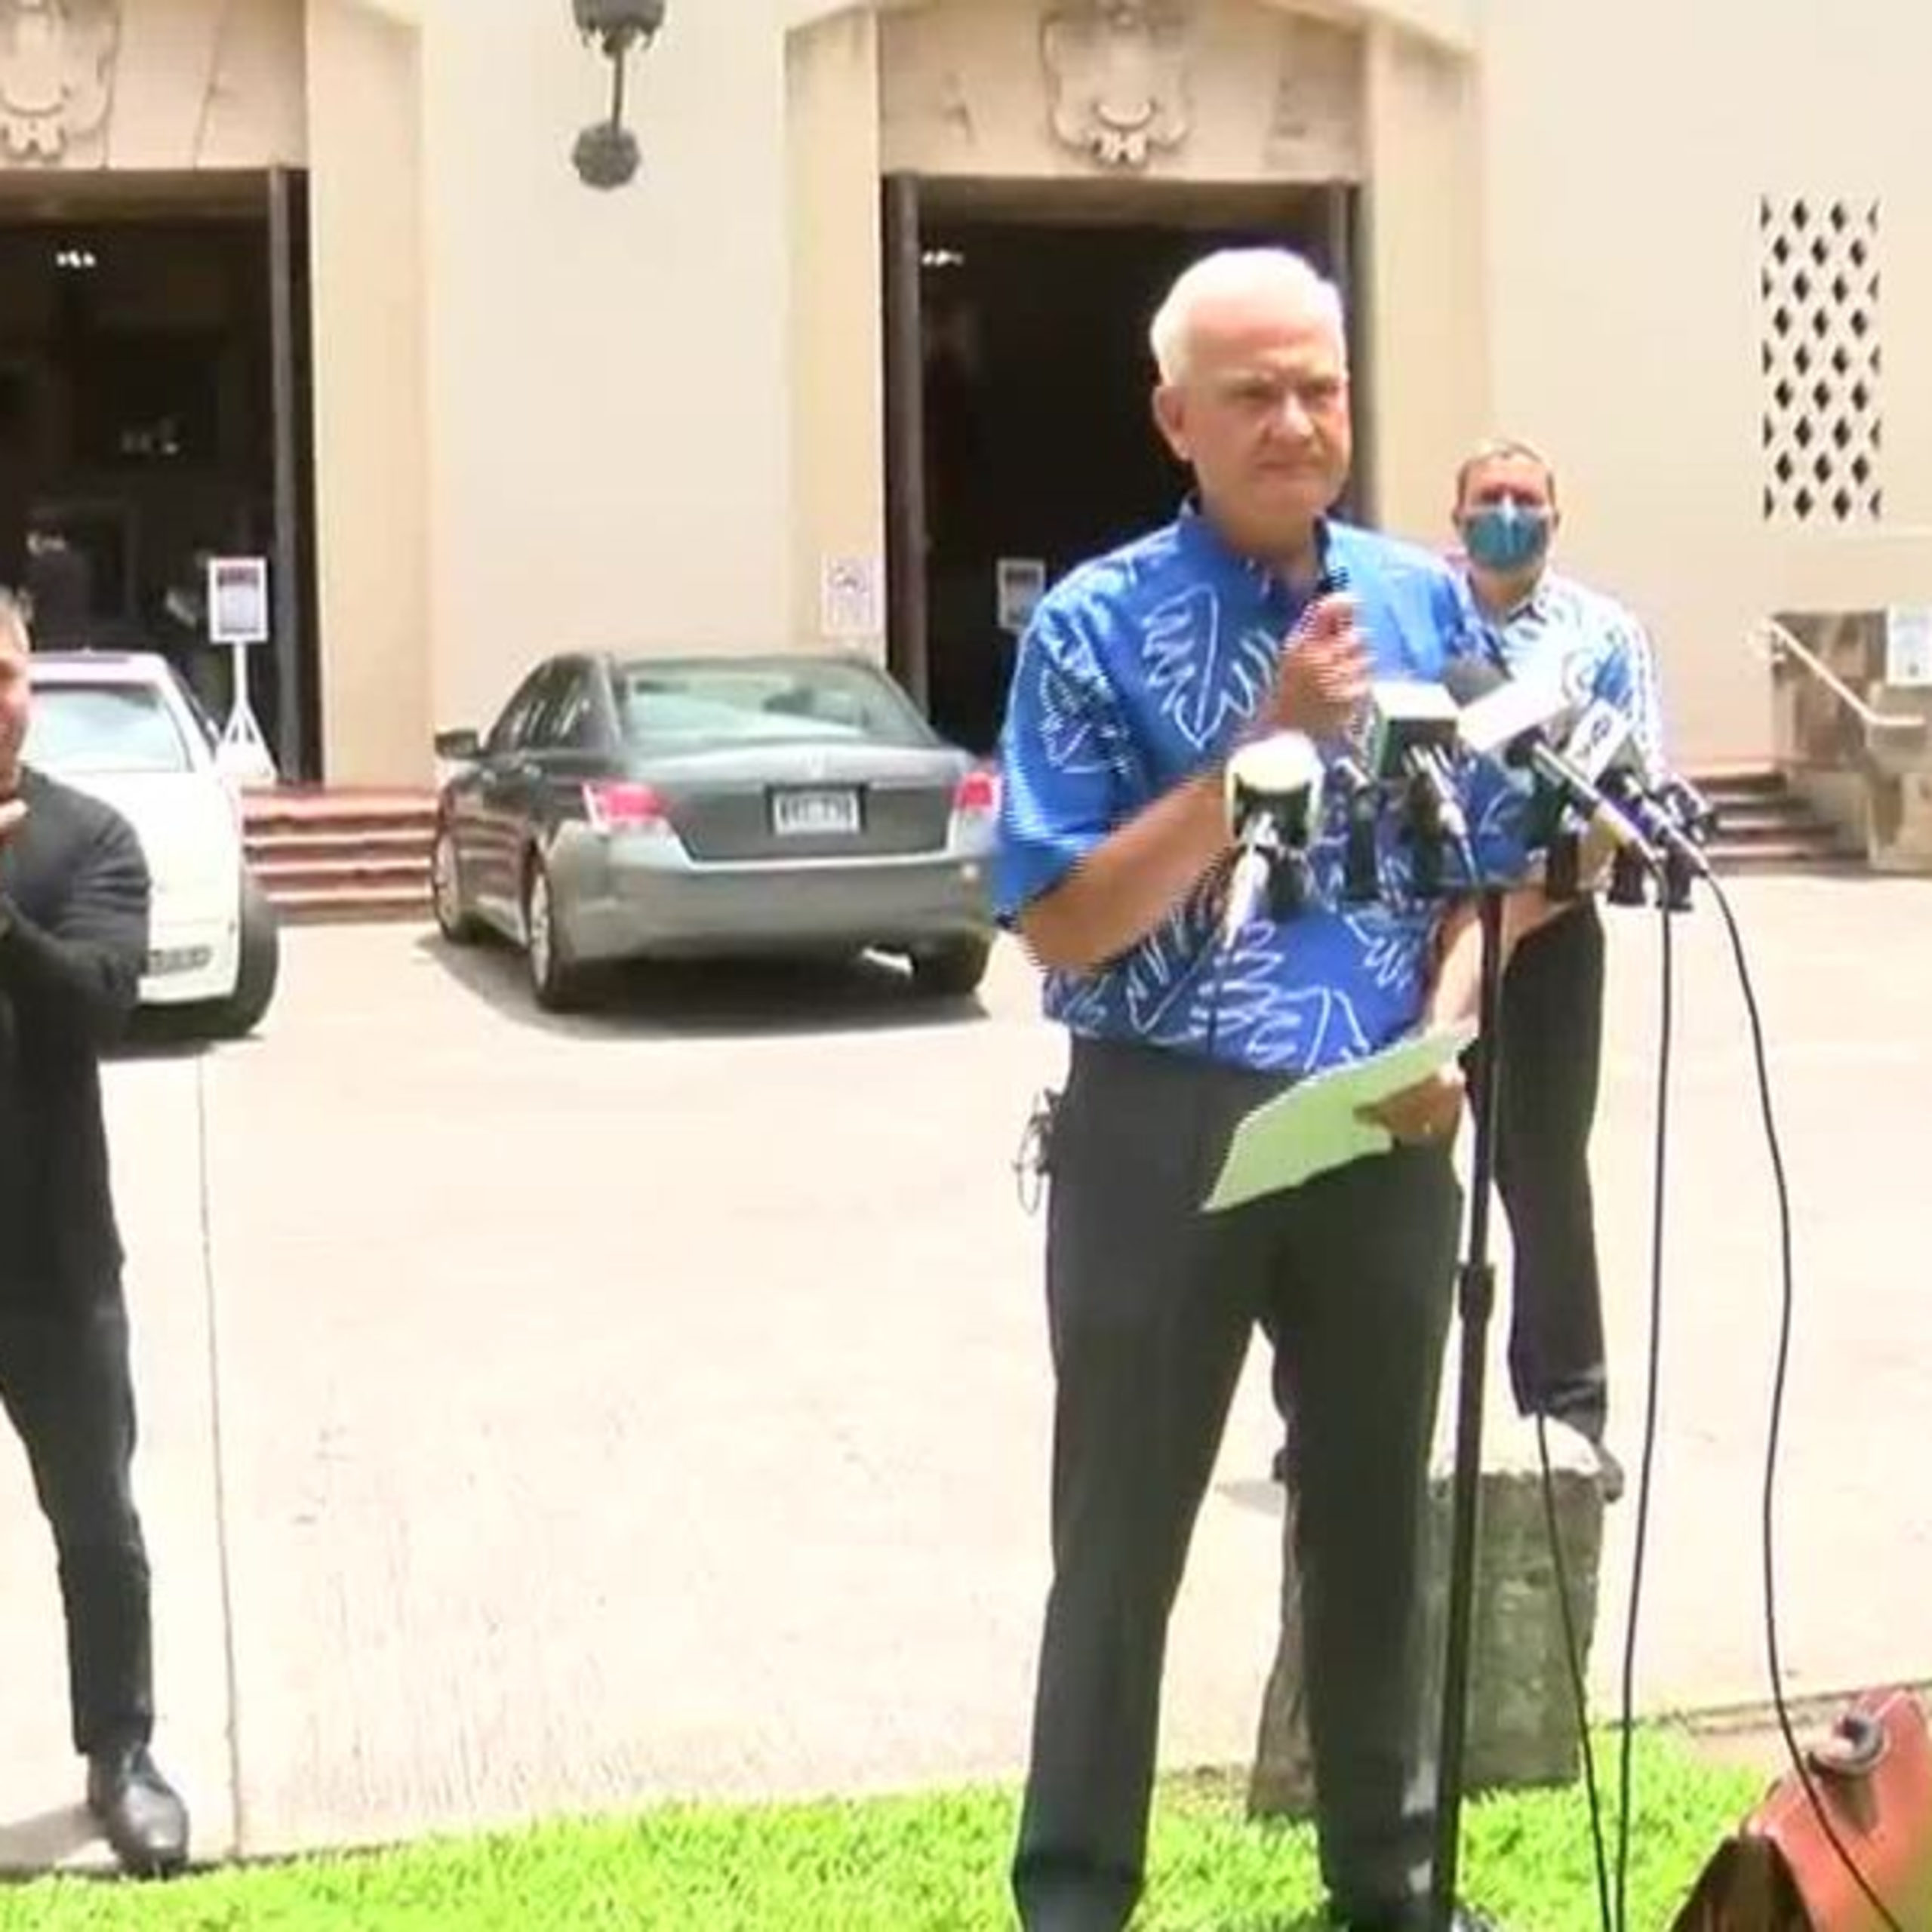 COVID-19: Honolulu may become another New York City warns mayor Caldwell